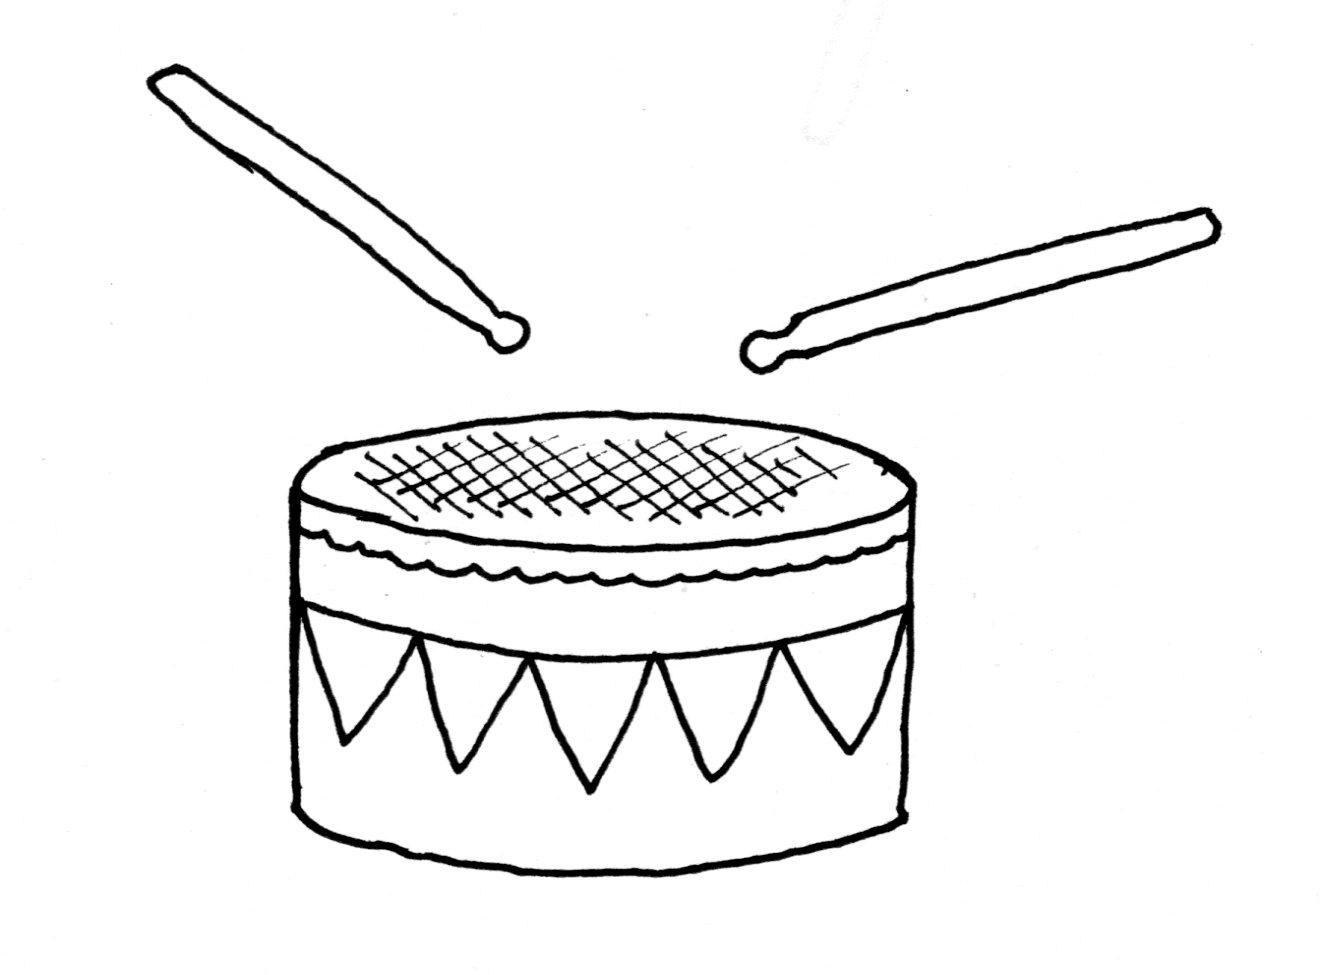 1320x975 Lucy Farfort Illustrator Quick Draw Results